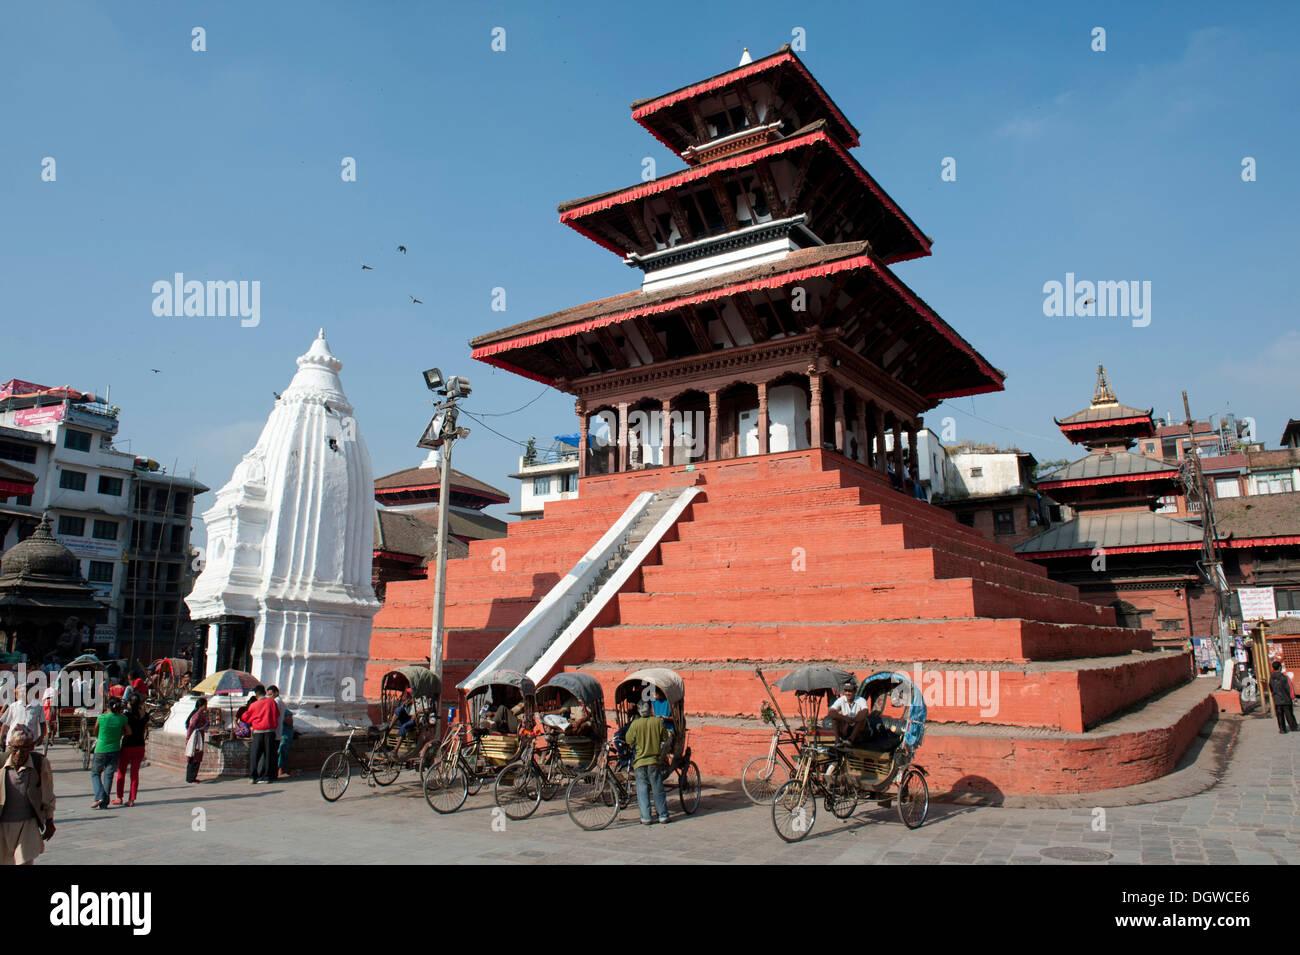 Hinduism, three-story Nepalese pagoda, architecture of the Newar, Shiva Temple Maju Deval, white shikhara, Durbar Square - Stock Image